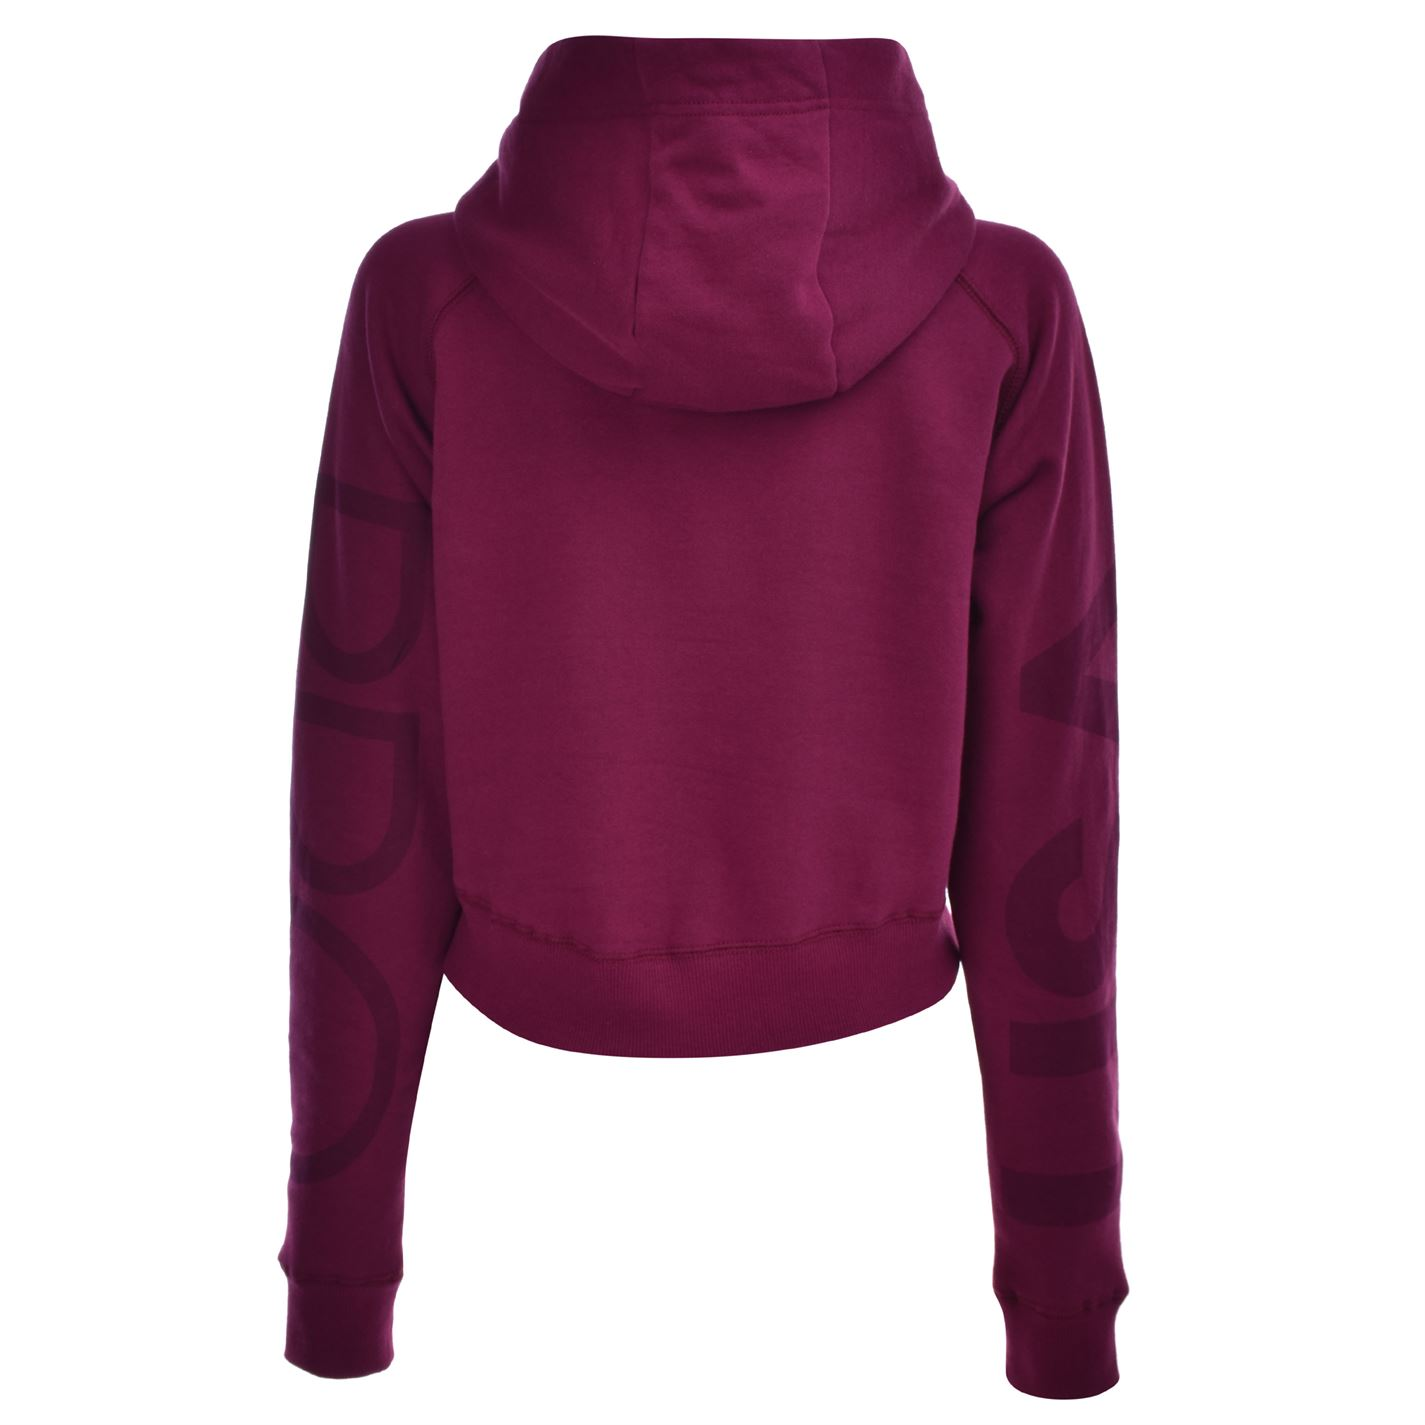 e68c5b87f9182 USA Pro Womens Crop Hoodie OTH Hoody Hooded Top Long Sleeve ...